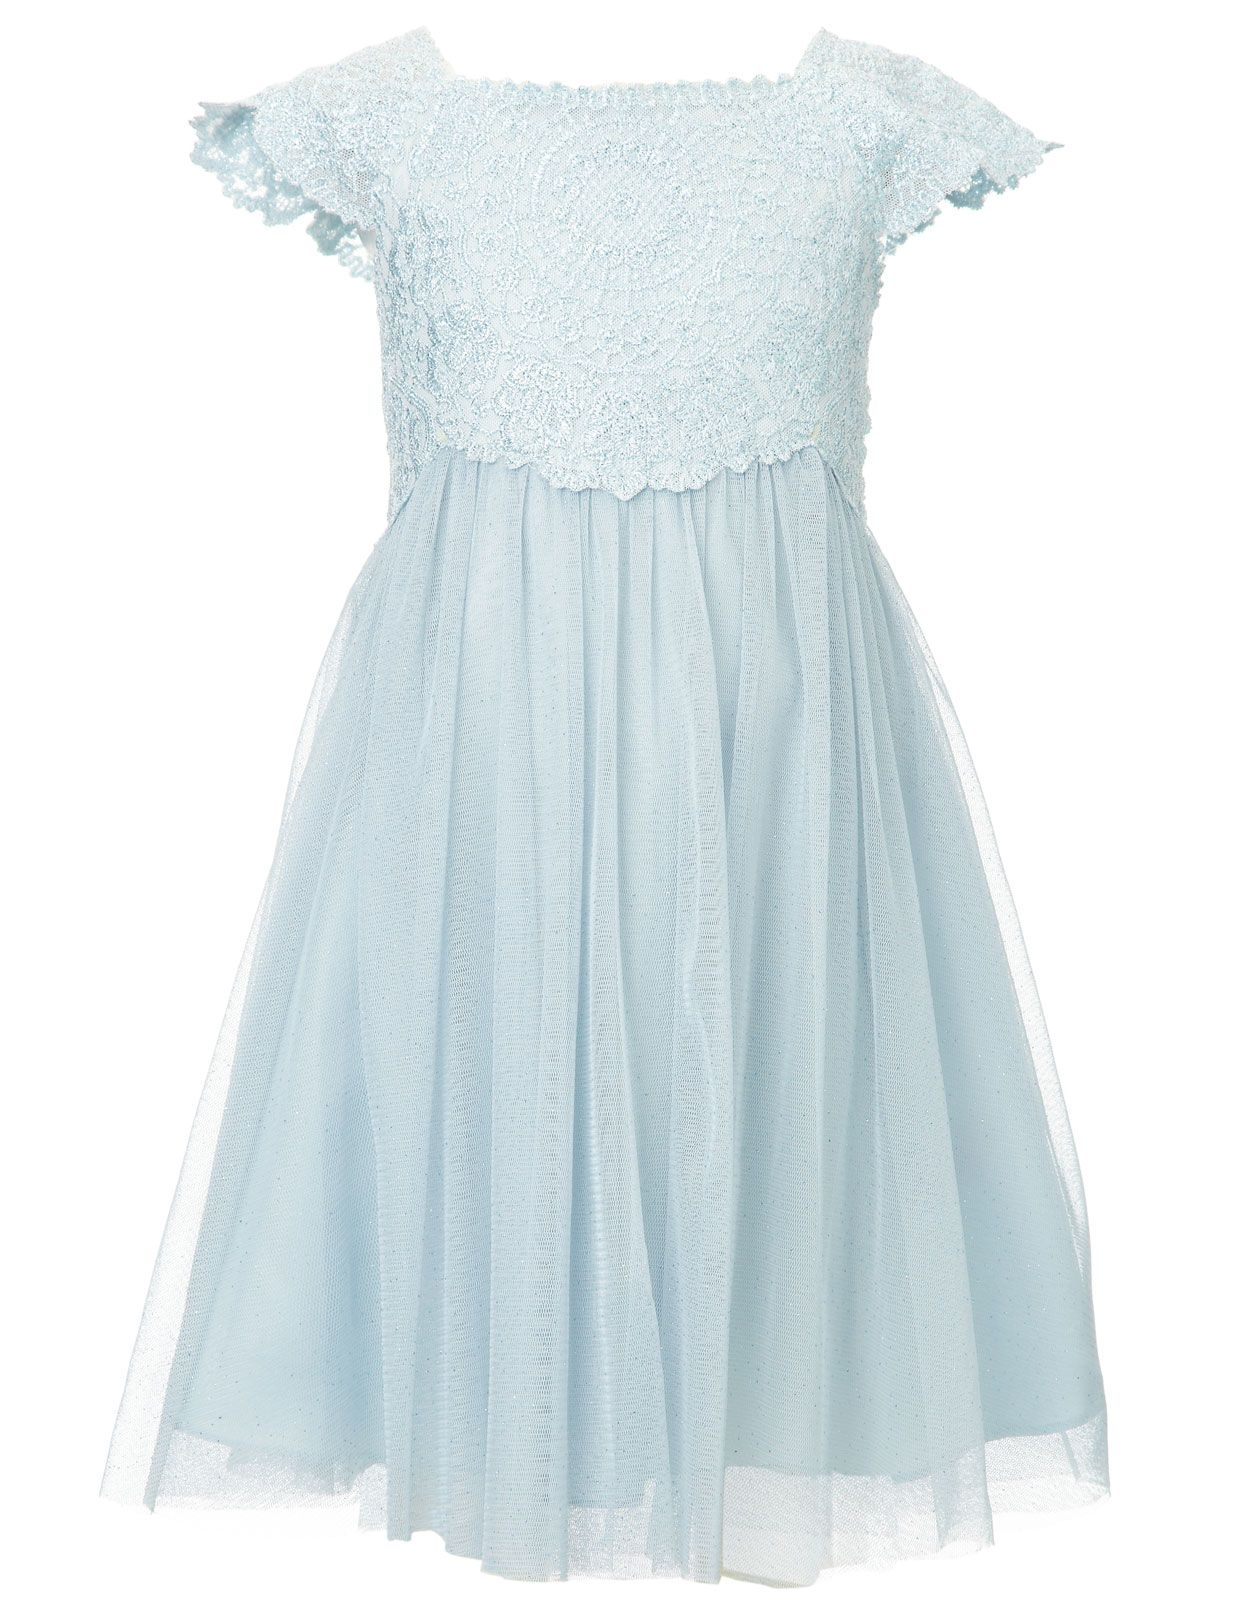 Baby Estella Glitter Dress Blue Monsoon Clothing